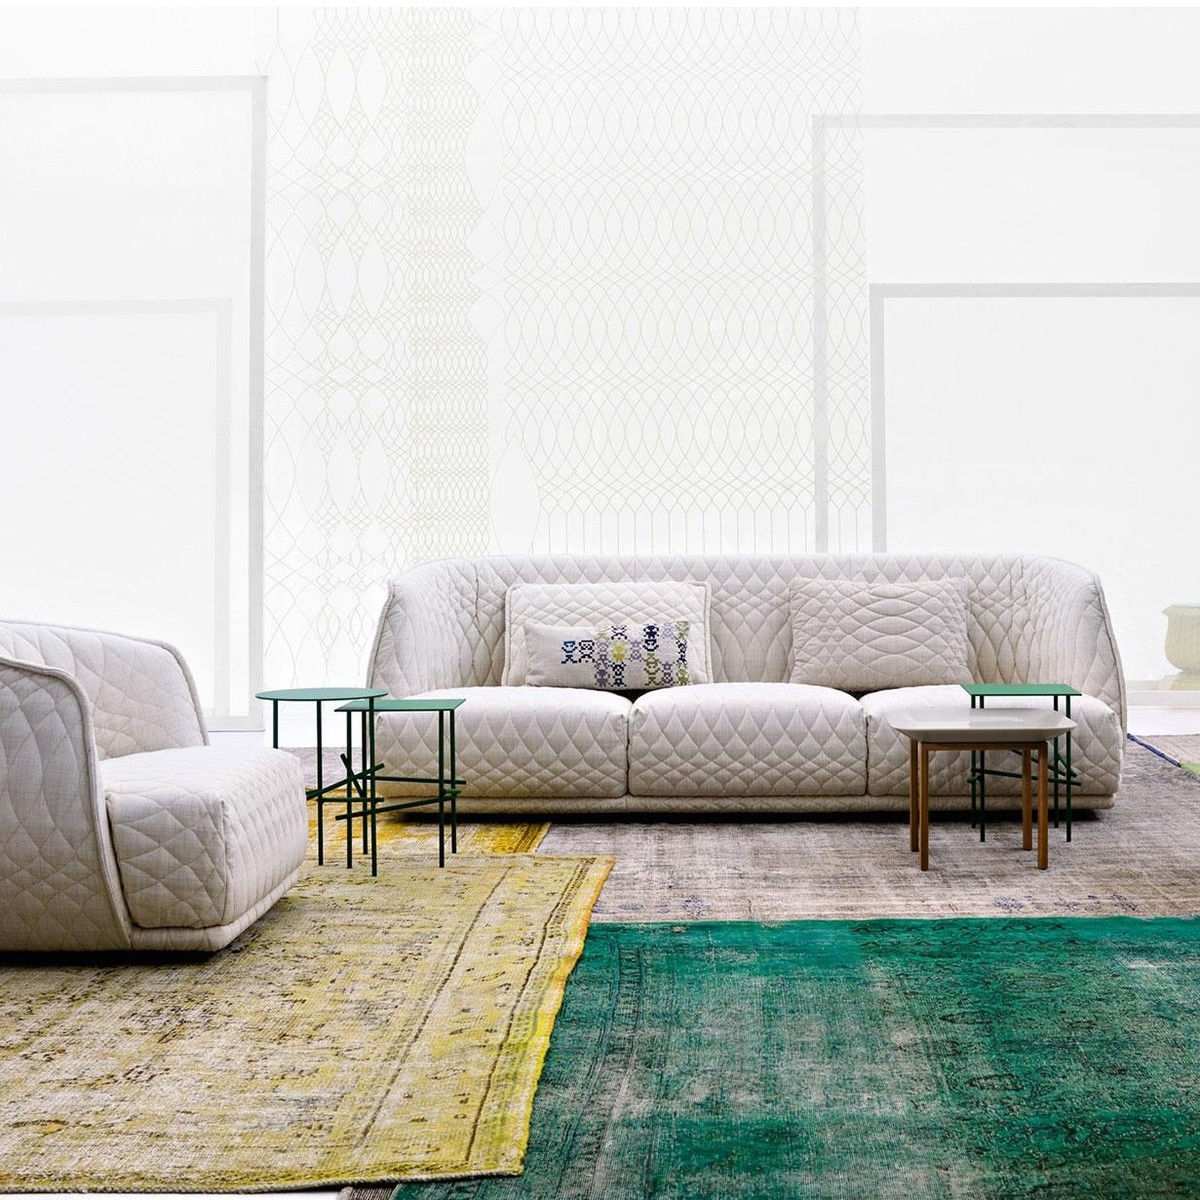 Redondo Sofa 4-Sitzer | Moroso | AmbienteDirect.com